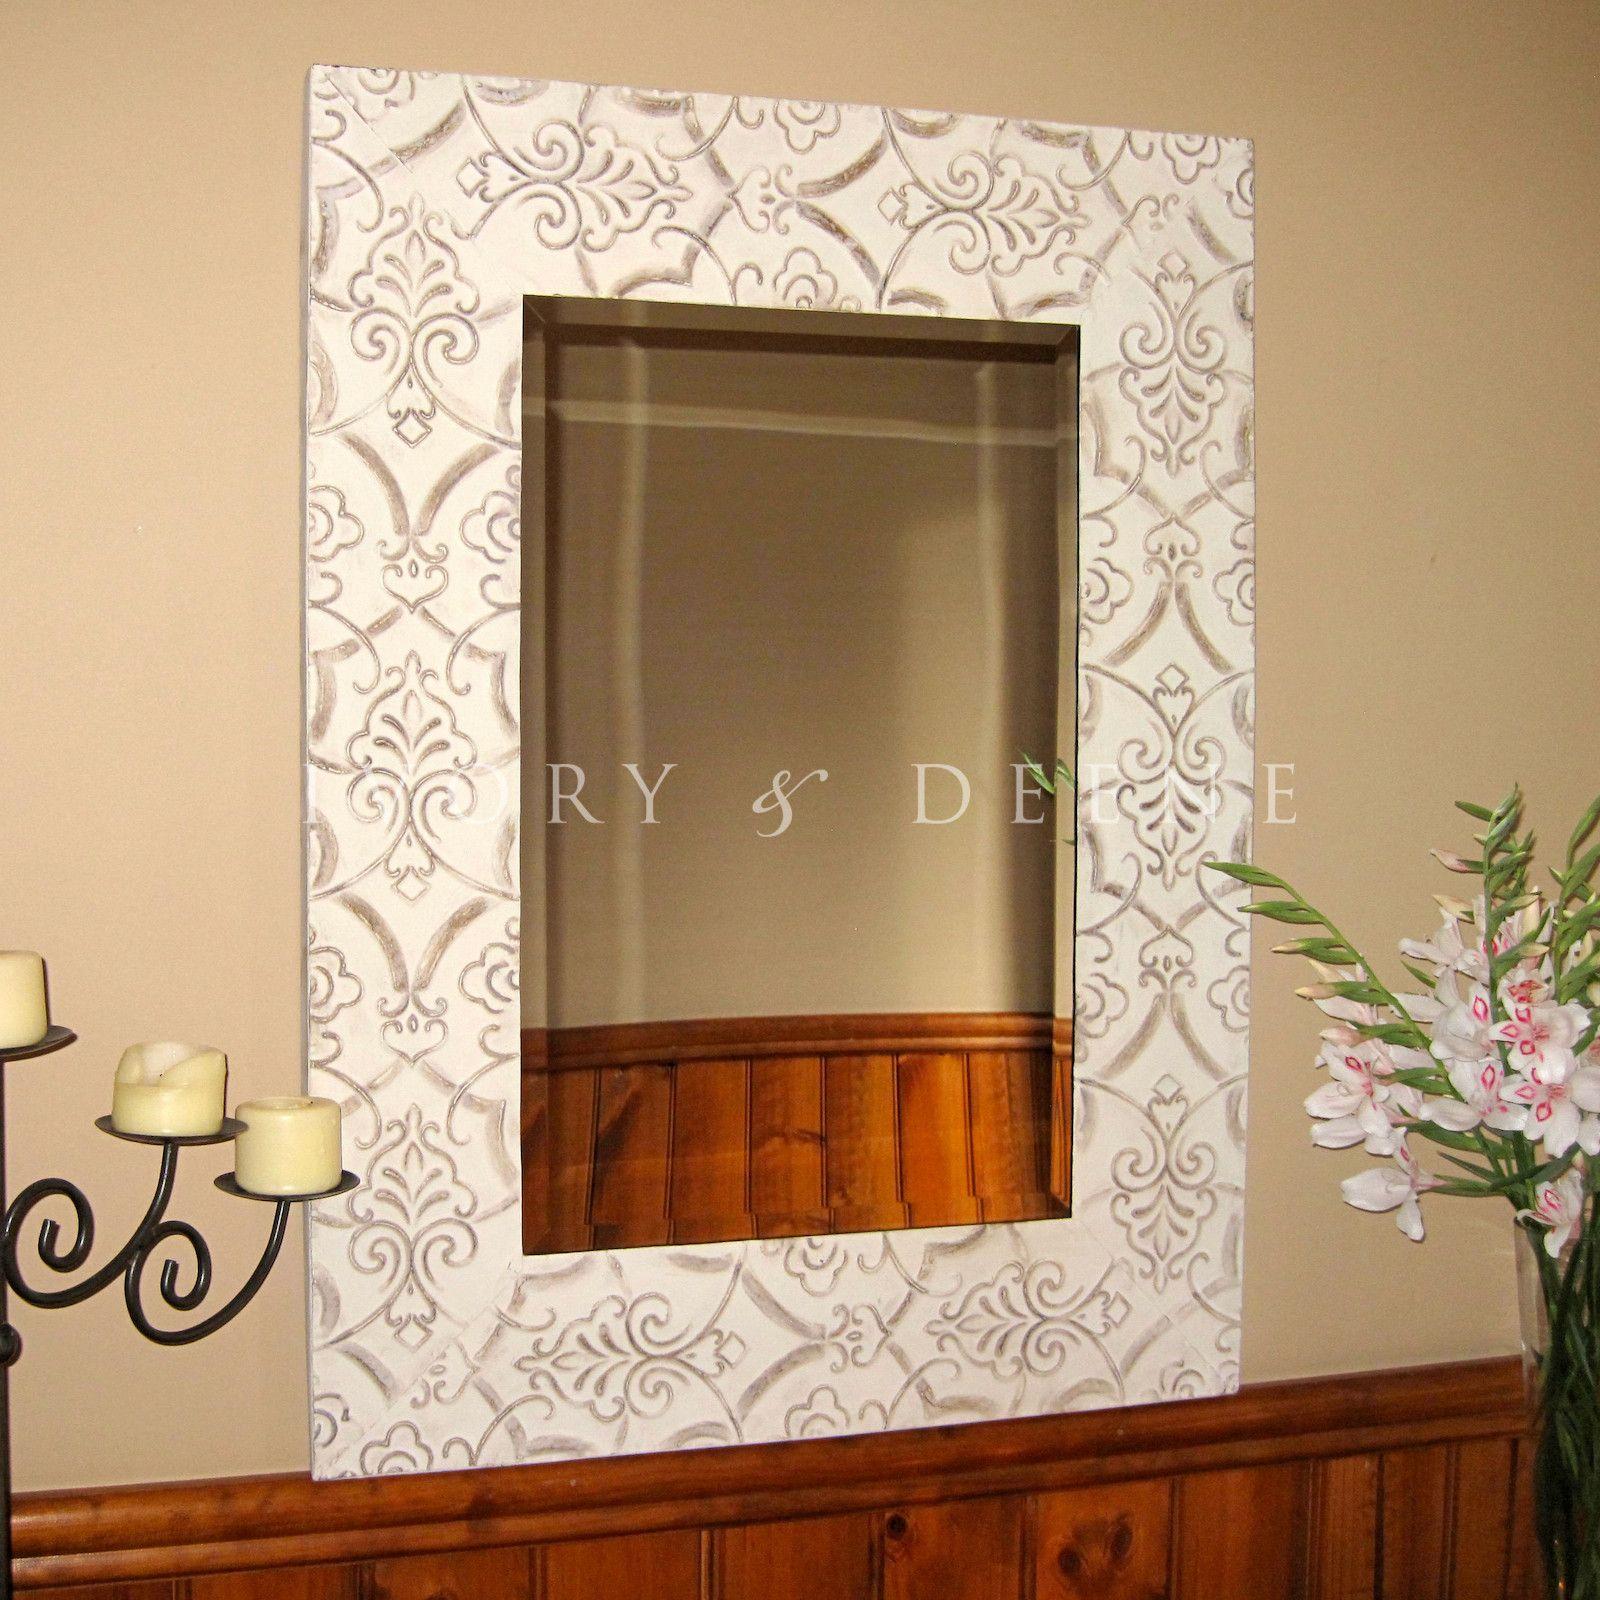 Window mirror decor  shabby french provincial rectangular mirror  design ideas